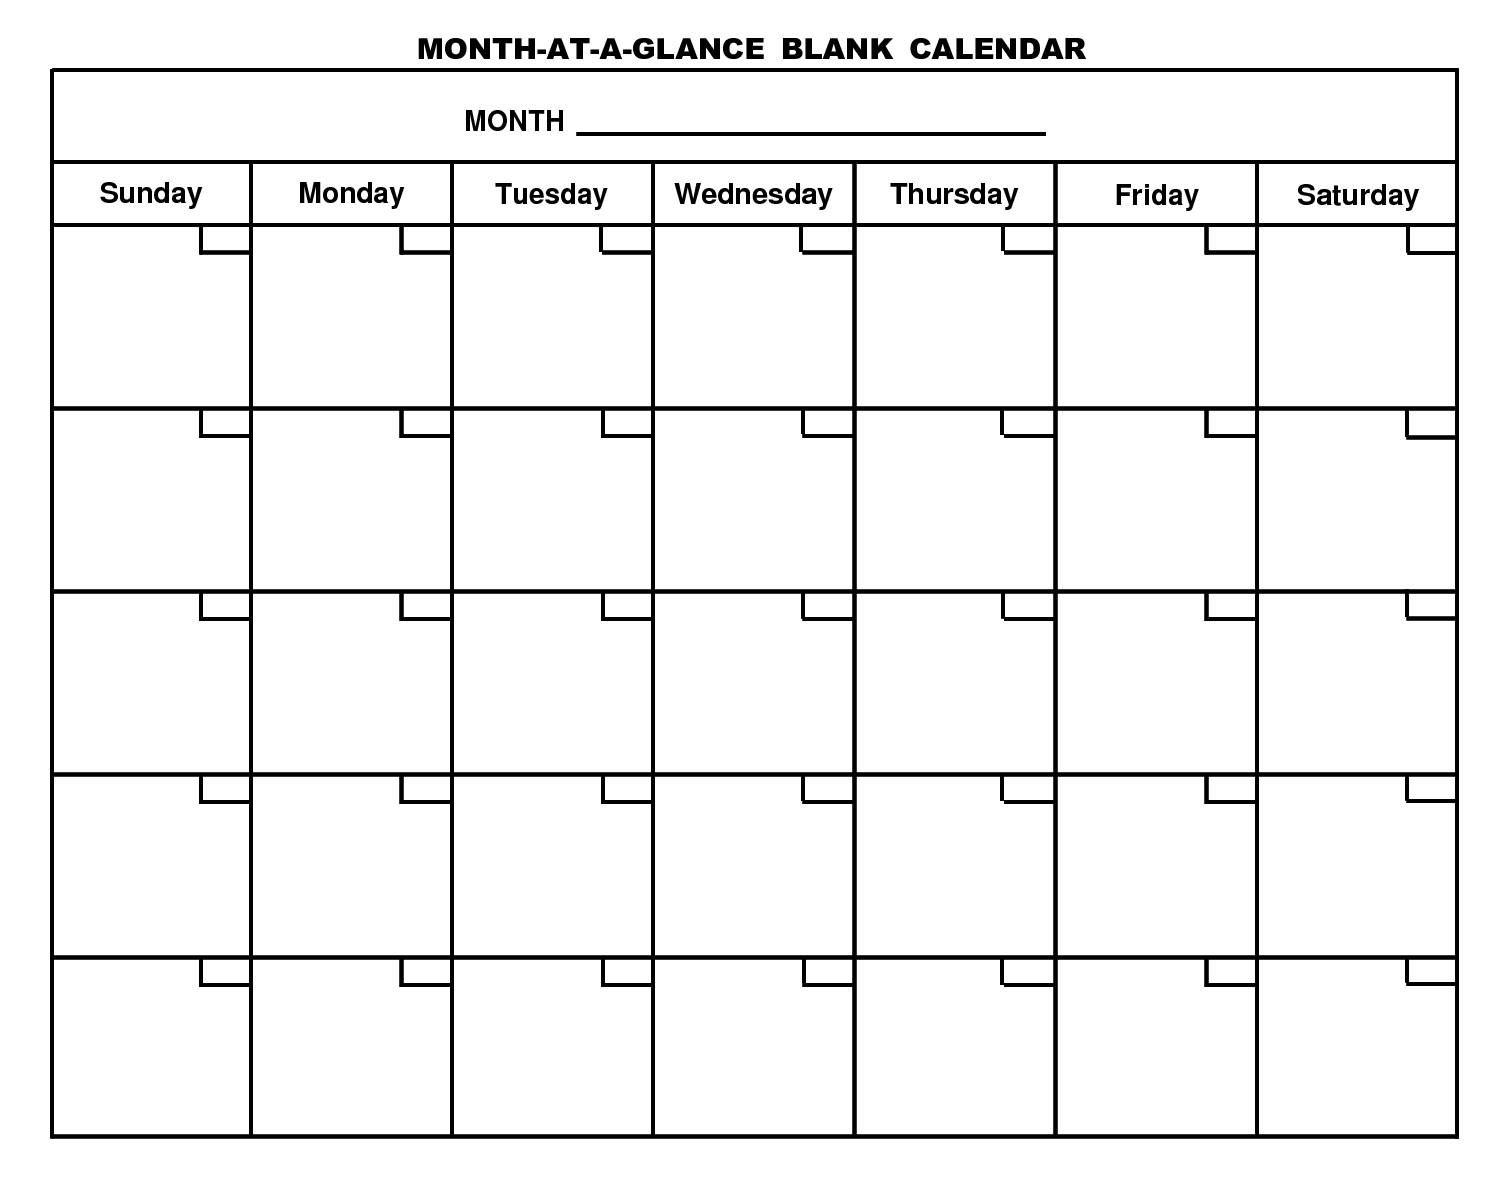 Blank Monthly Calendars Yahoo Search Results Umw Pinterest 89uj